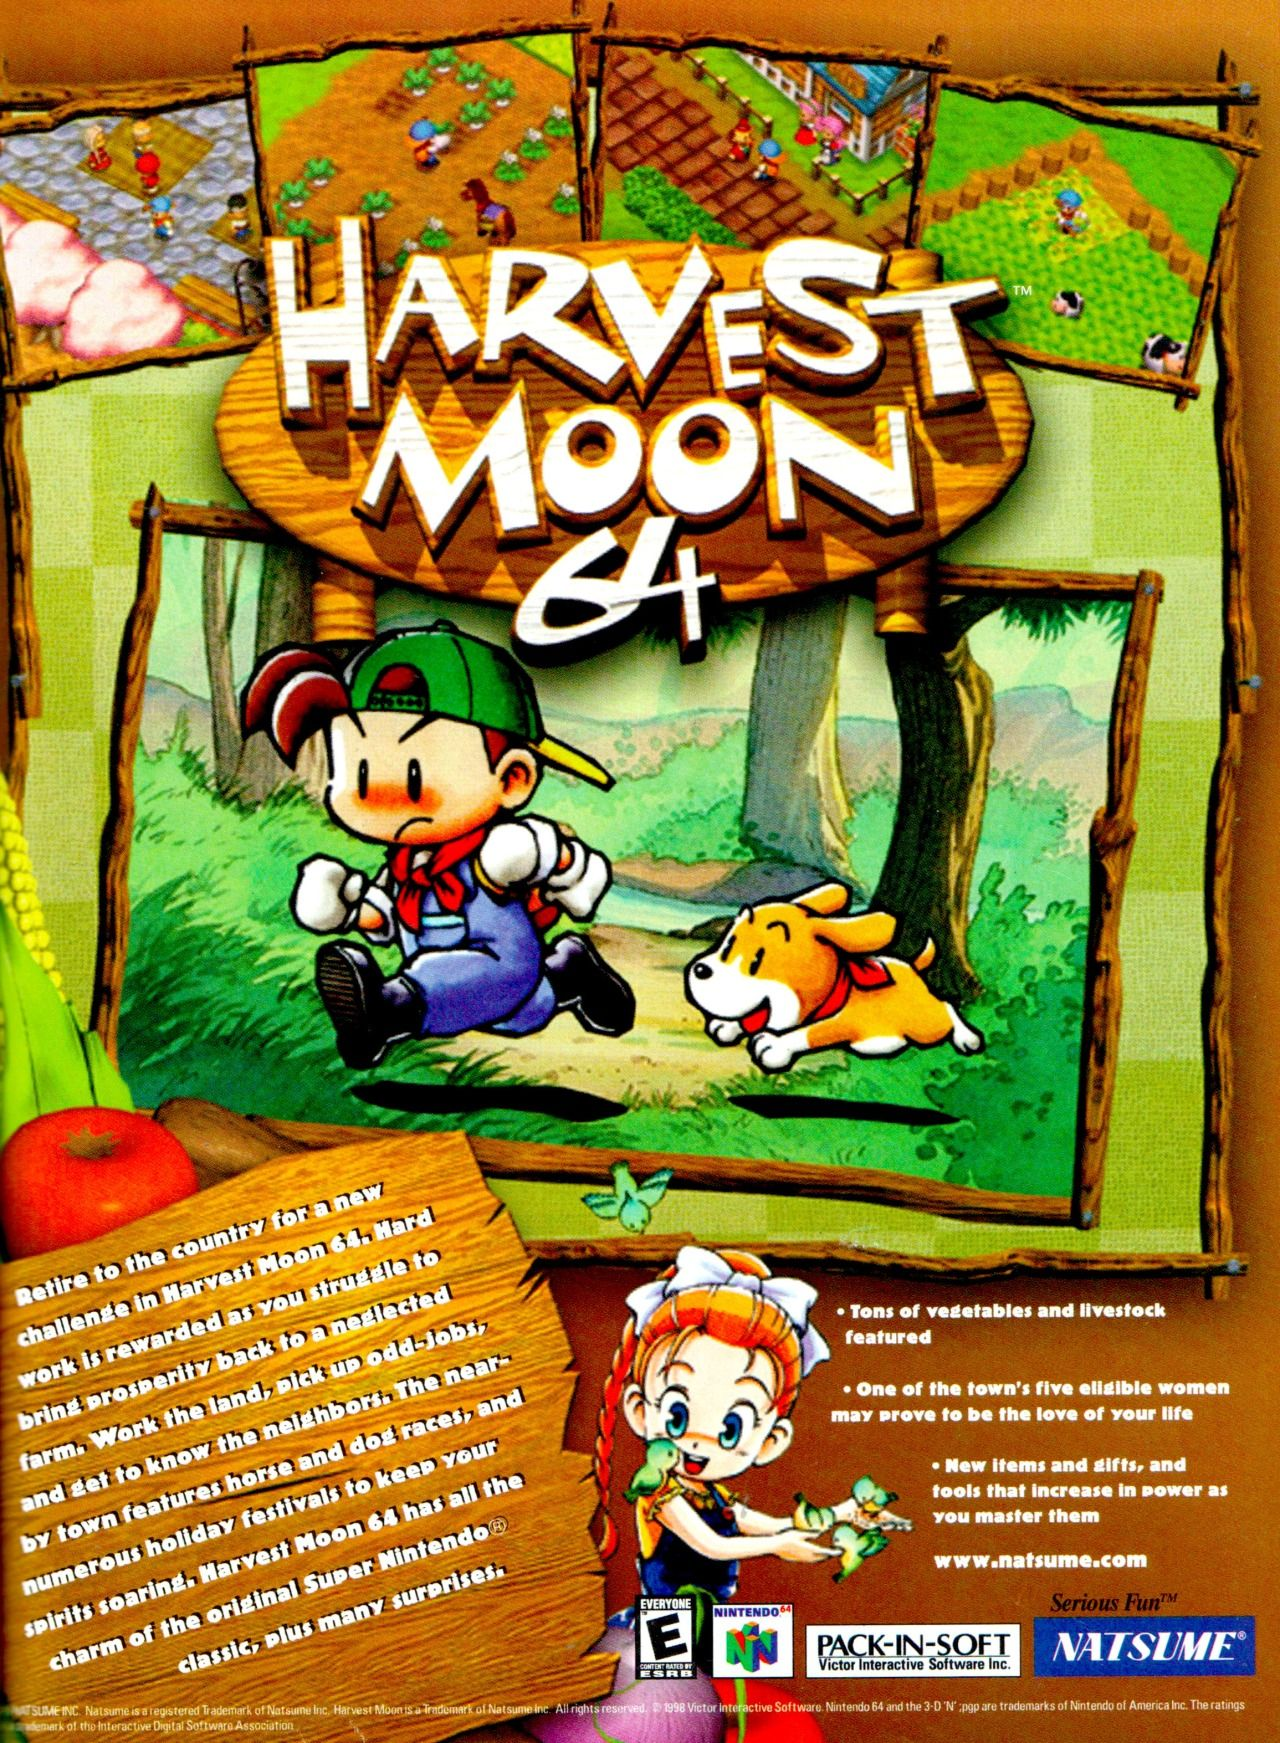 Harvest Moon 64 (1999) Harvest moon 64, Harvest moon